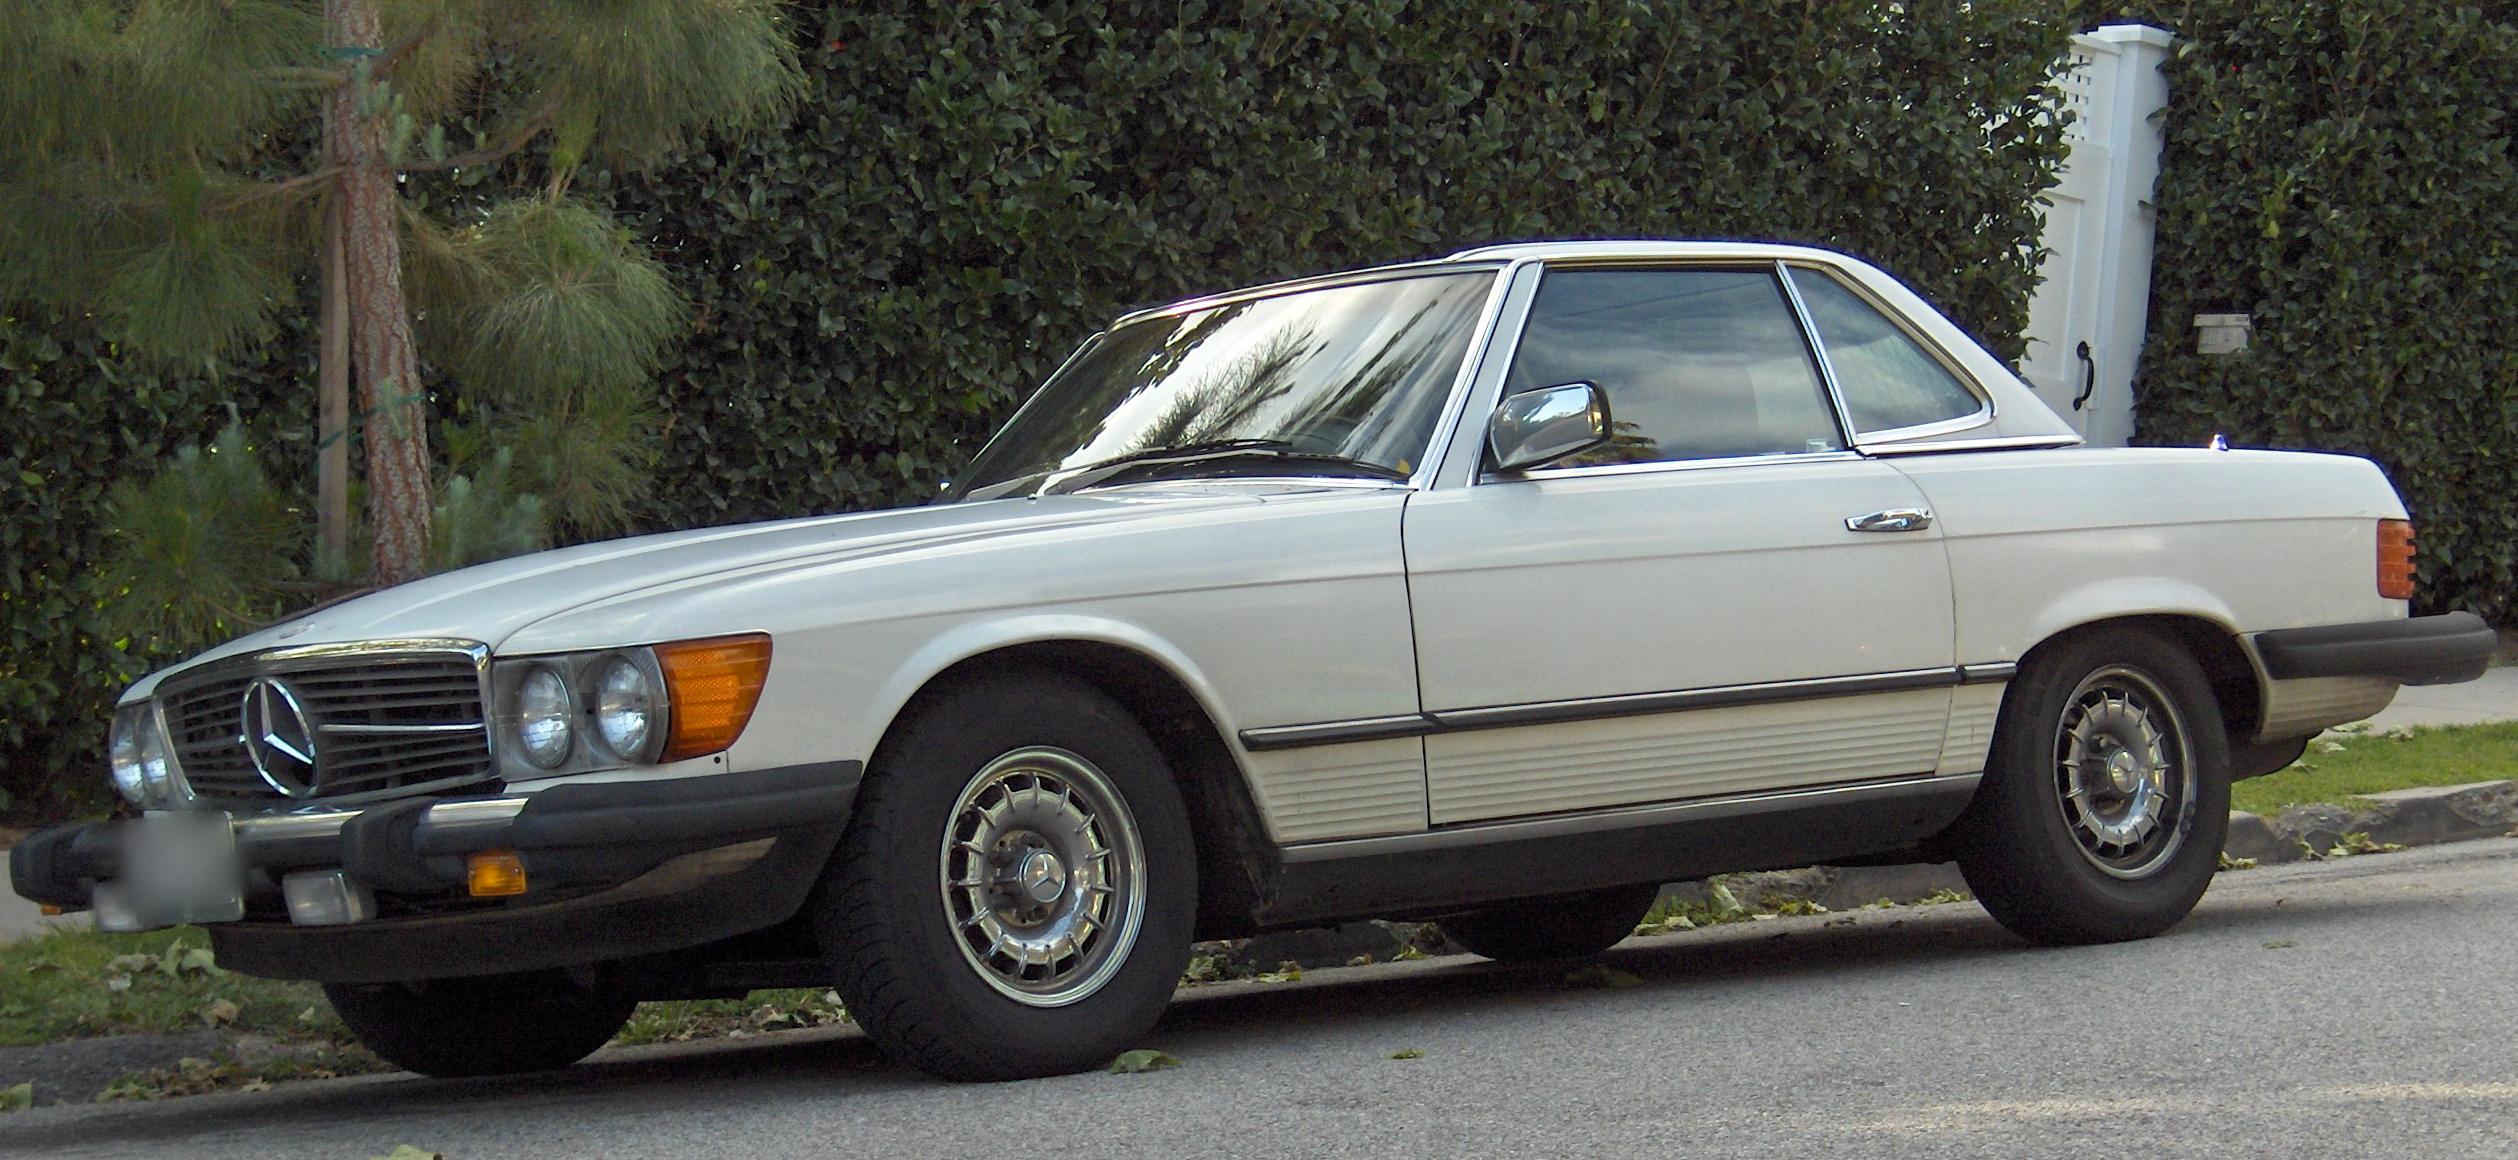 Mercedes Benz History Of Models >> File:Mercedes-Benz 450SL US Model.jpg - Wikimedia Commons